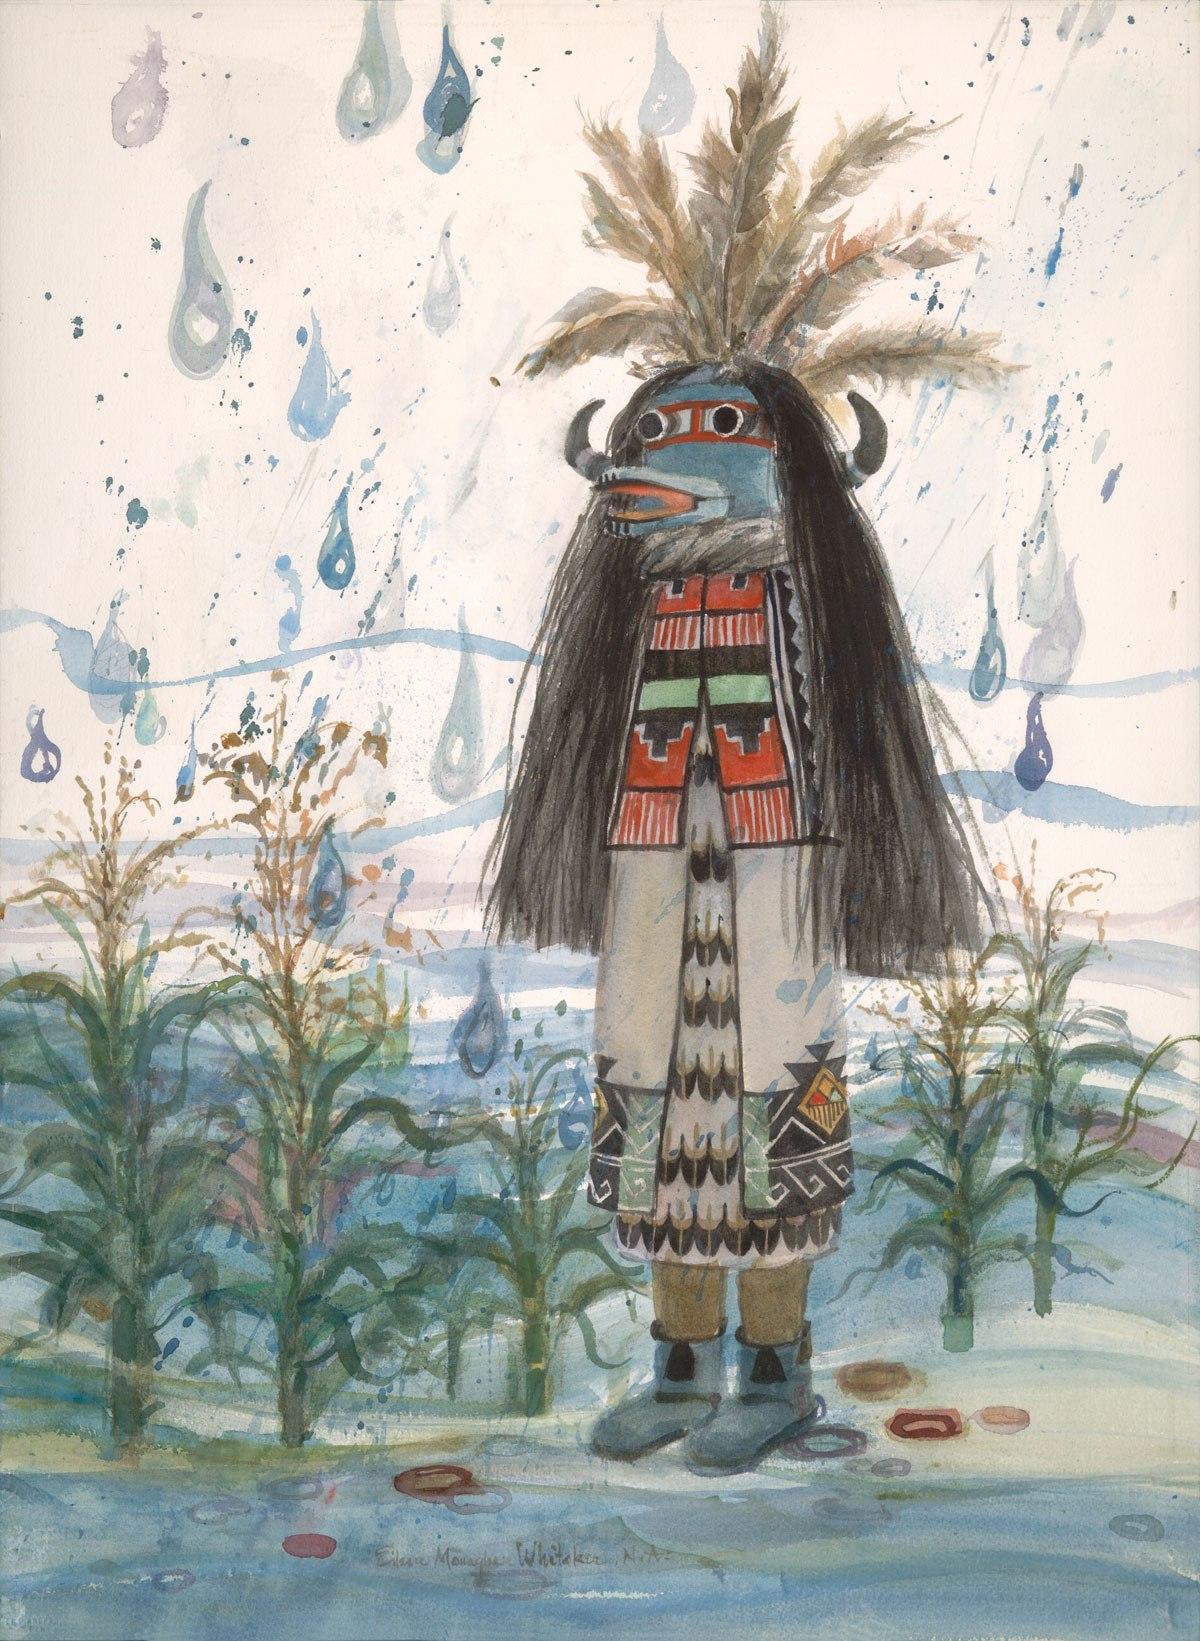 """Kachina Springtime Rain"" 1986 © Eileen Monaghan Whitaker N.A.  30x22 inches Watercolor"